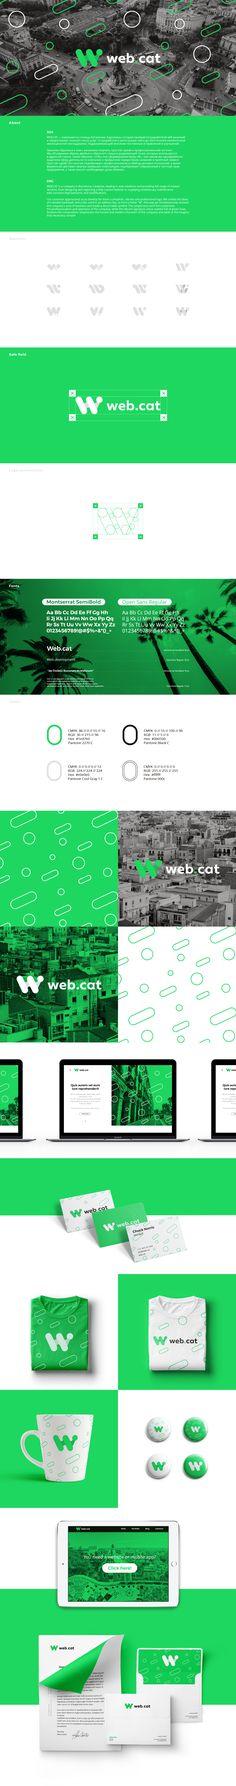 Web.cat on Behance